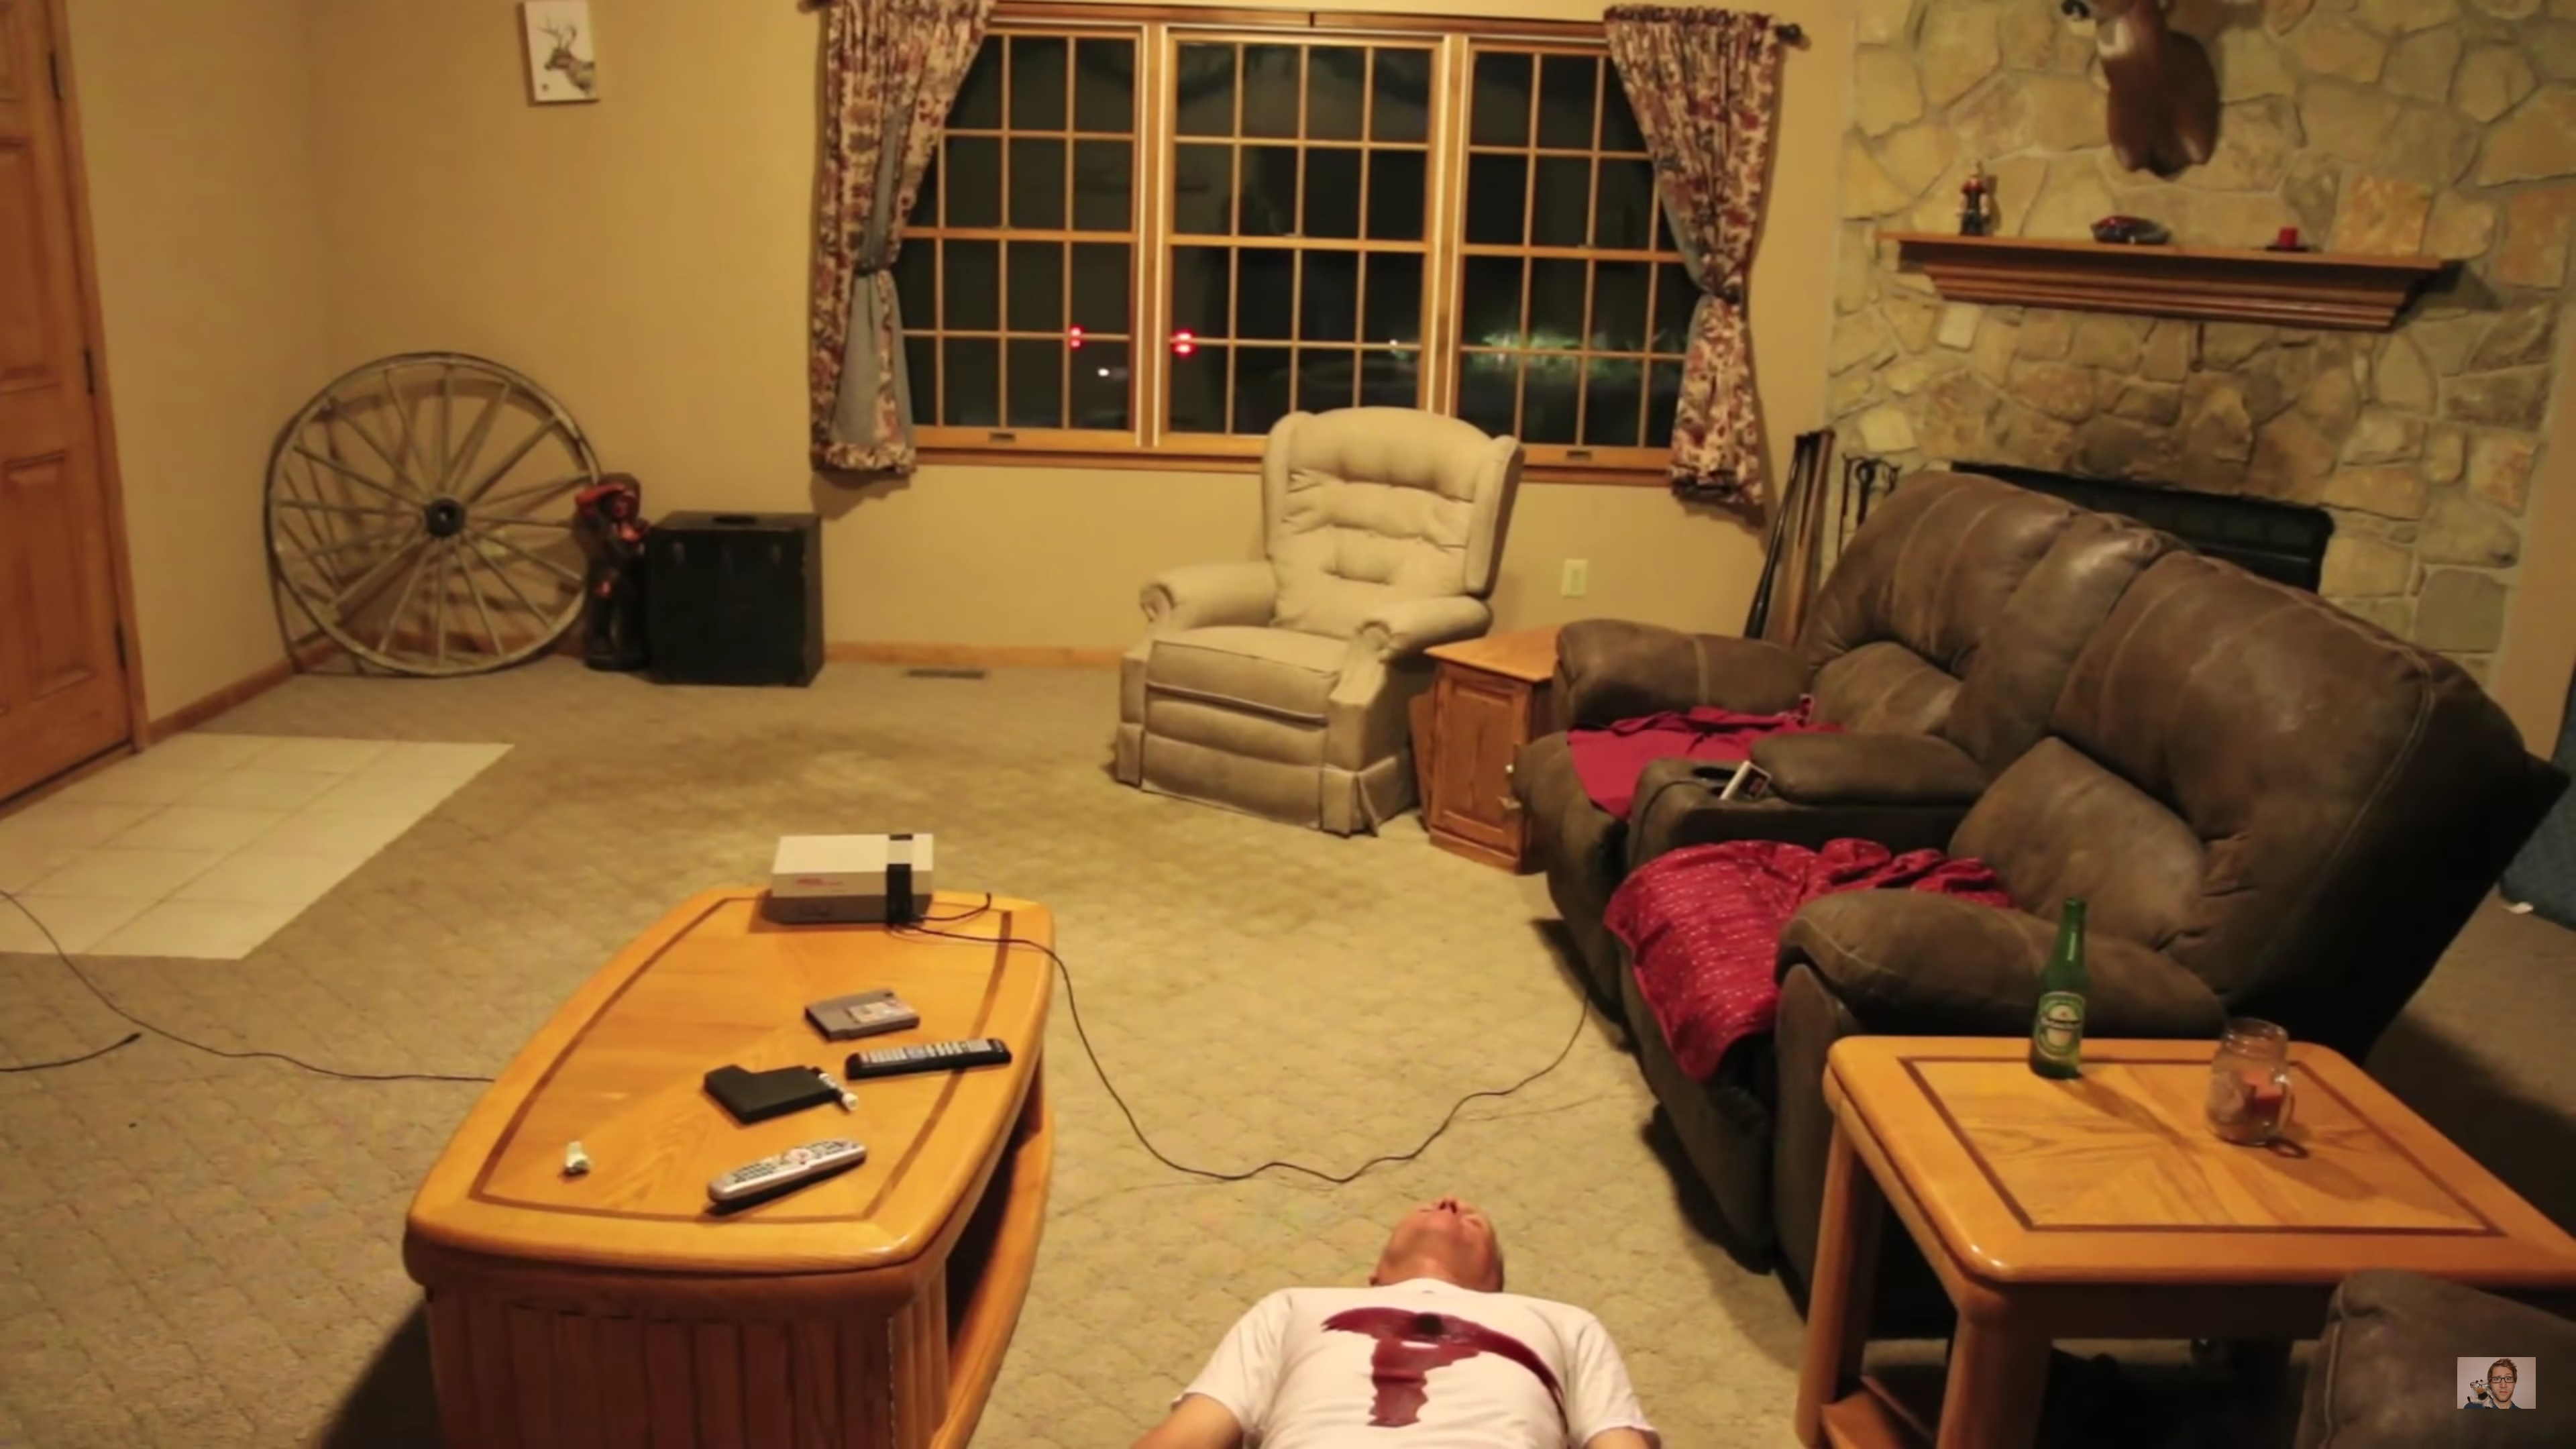 McJuggerNuggets Psycho Room Living Room Furniture Home